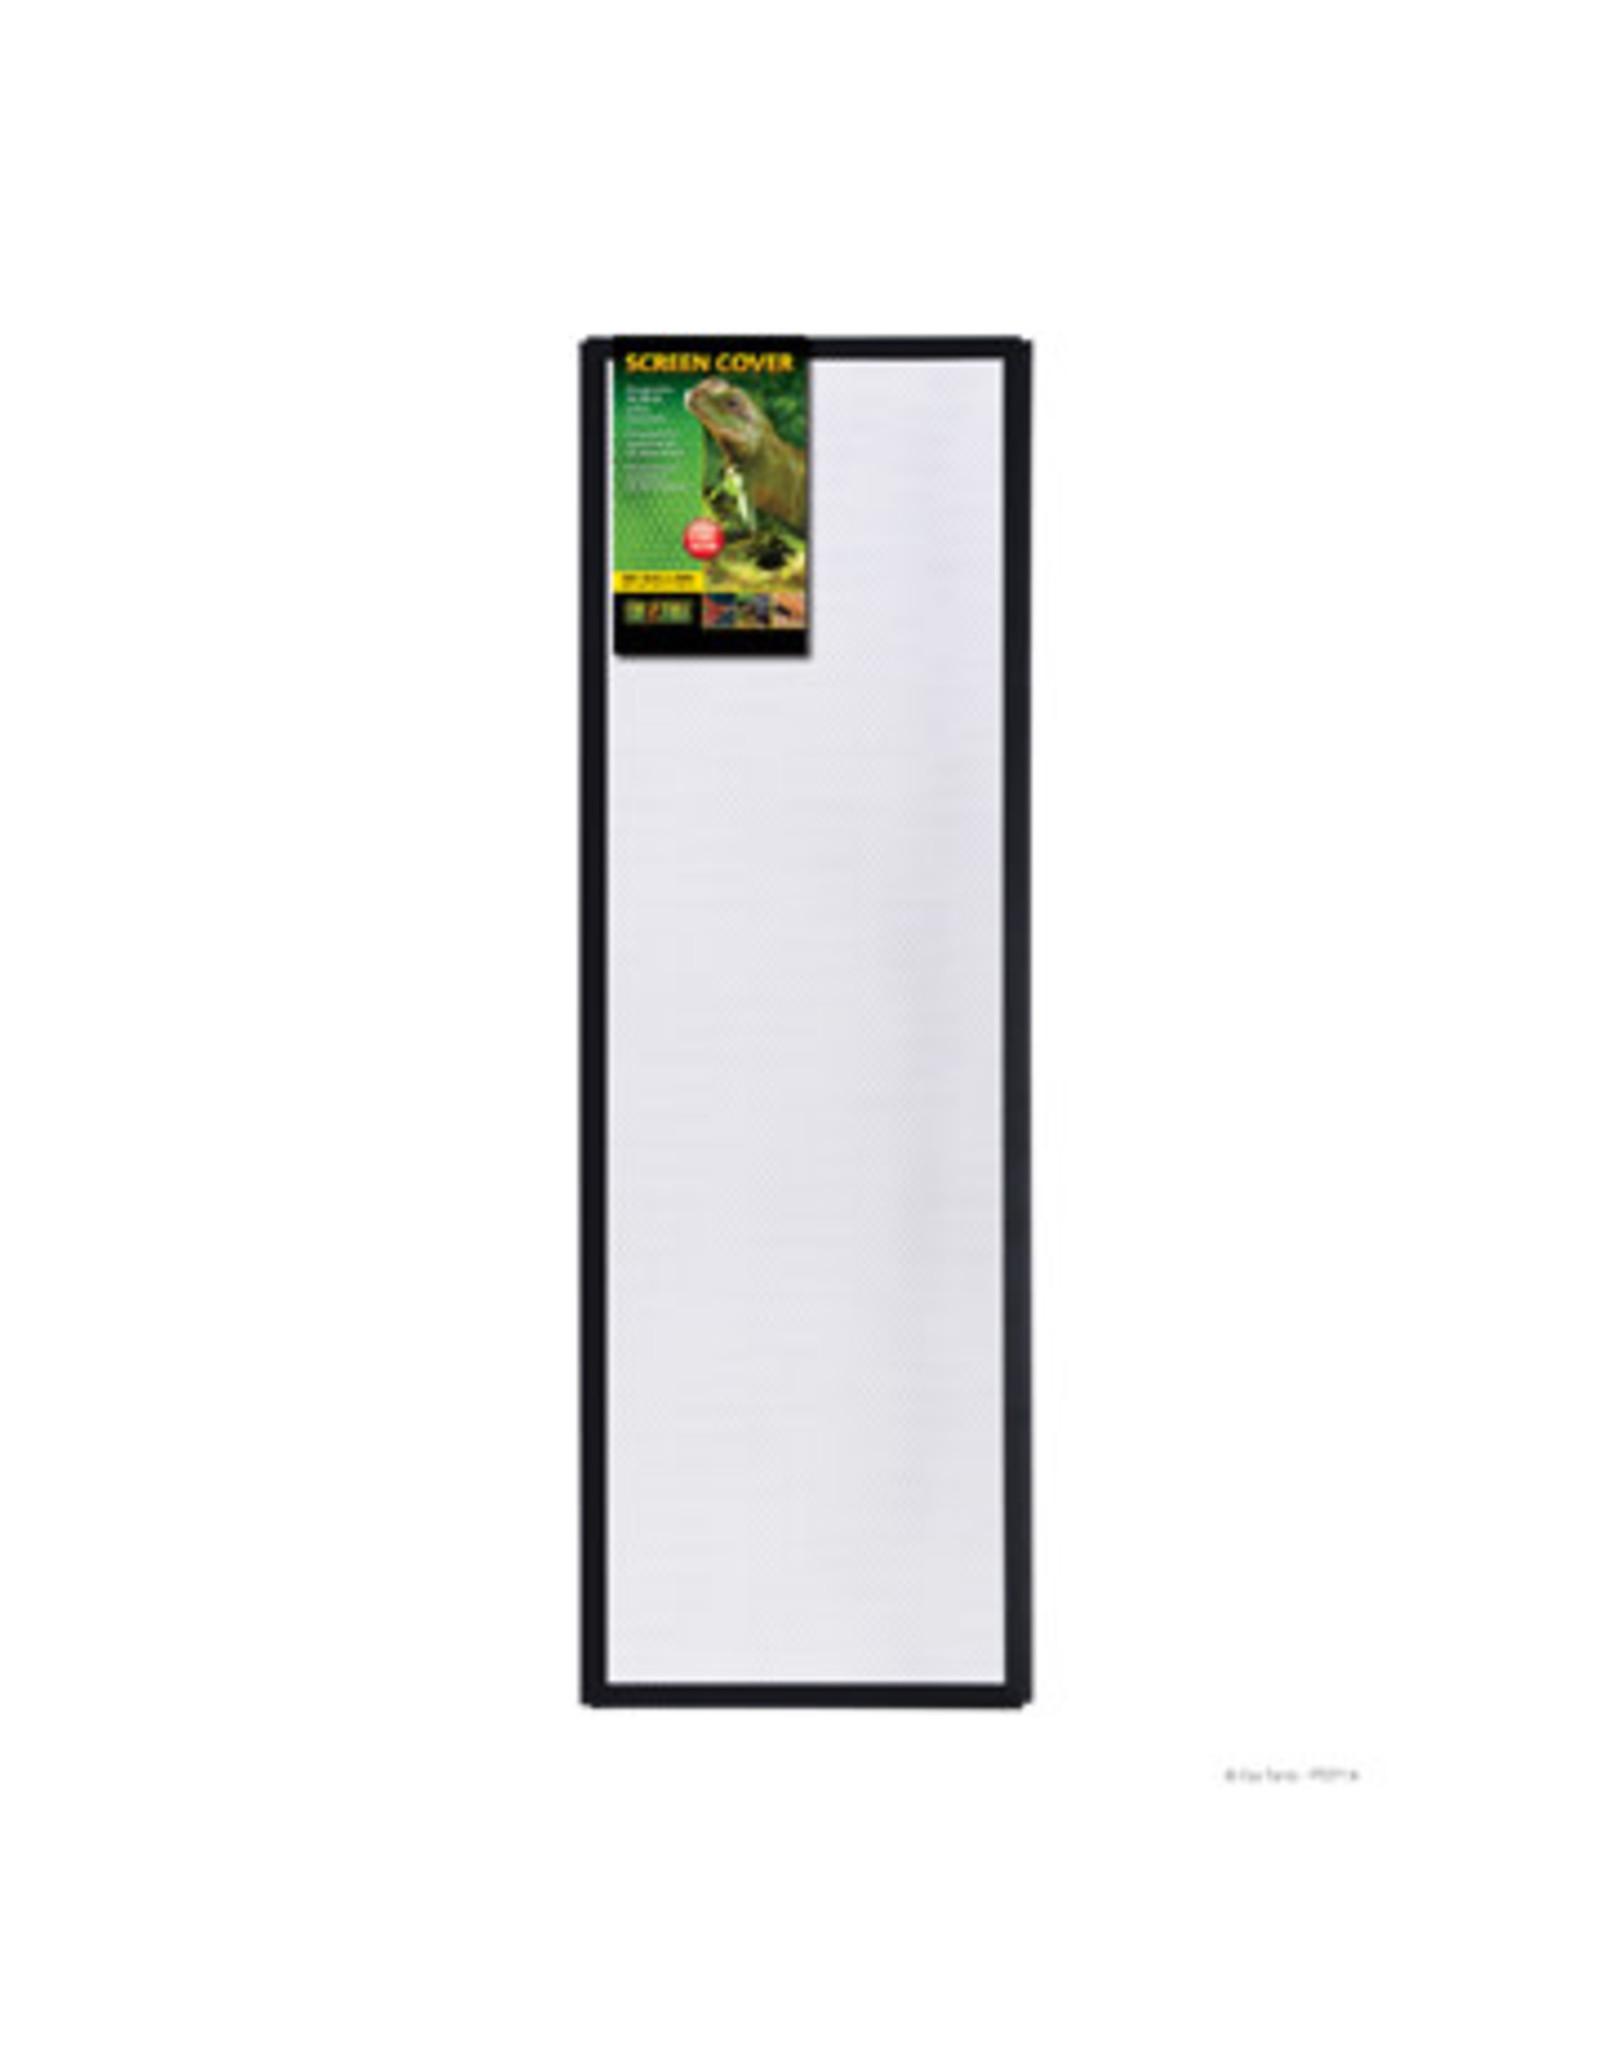 Exo Terra Terrarium Screen Cover - 91 x 30 cm (36 x 12 in)